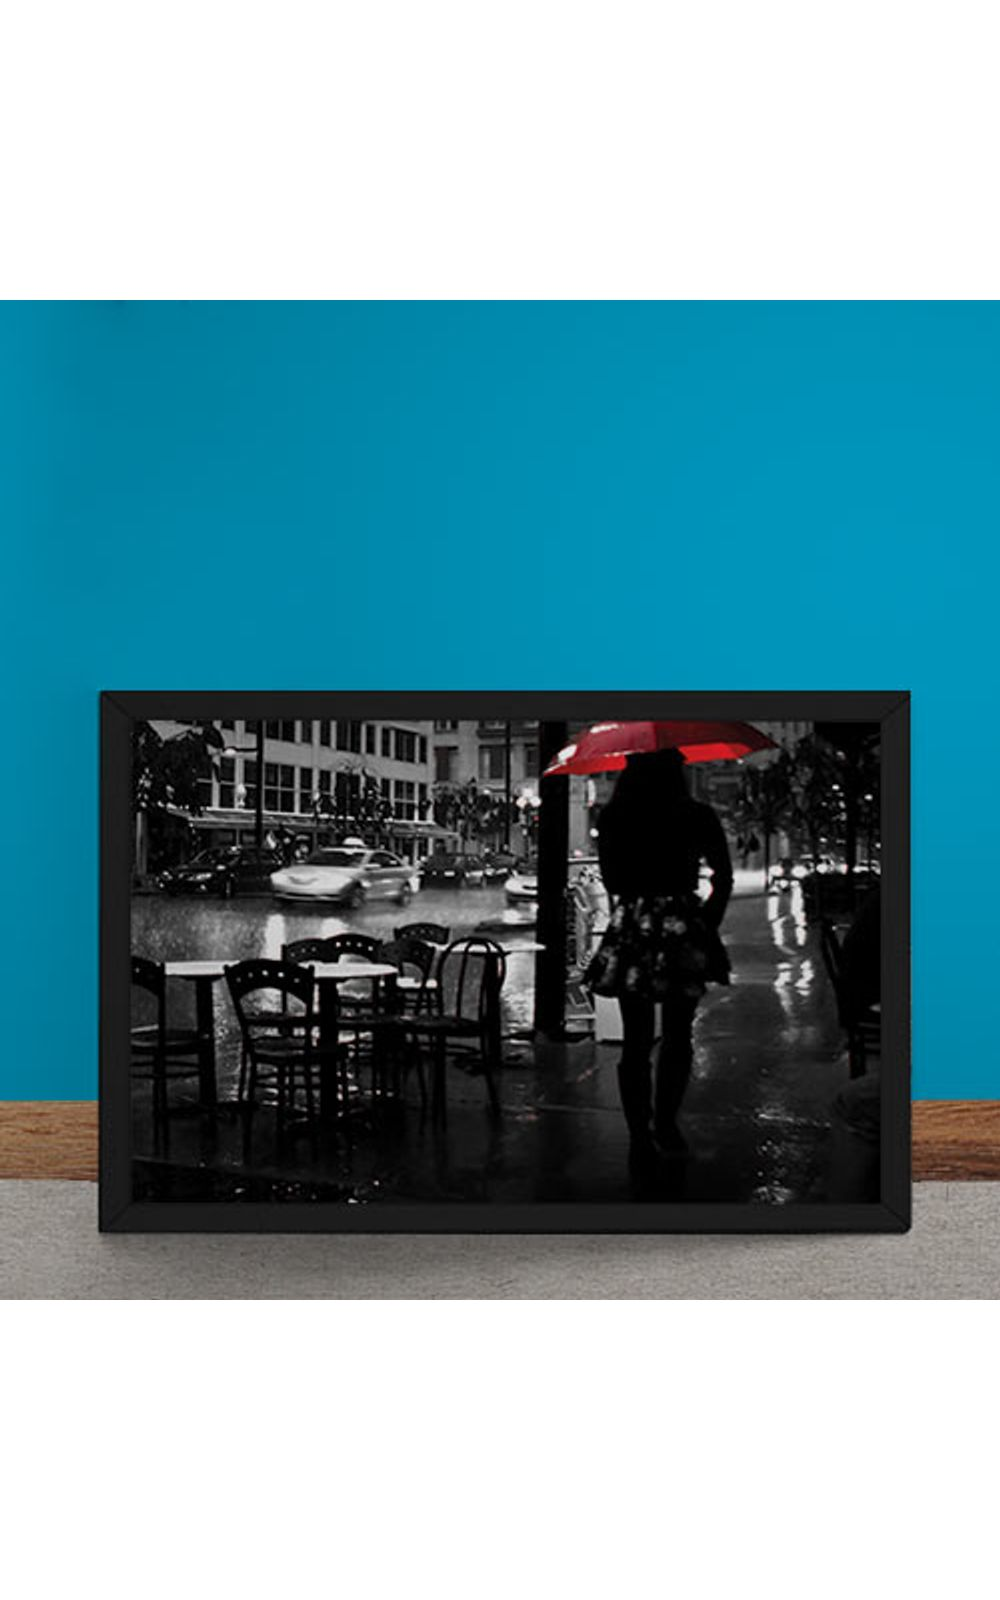 Foto 6 - Quadro Decorativo Noite Chuvosa Guarda Chuva Vermelho